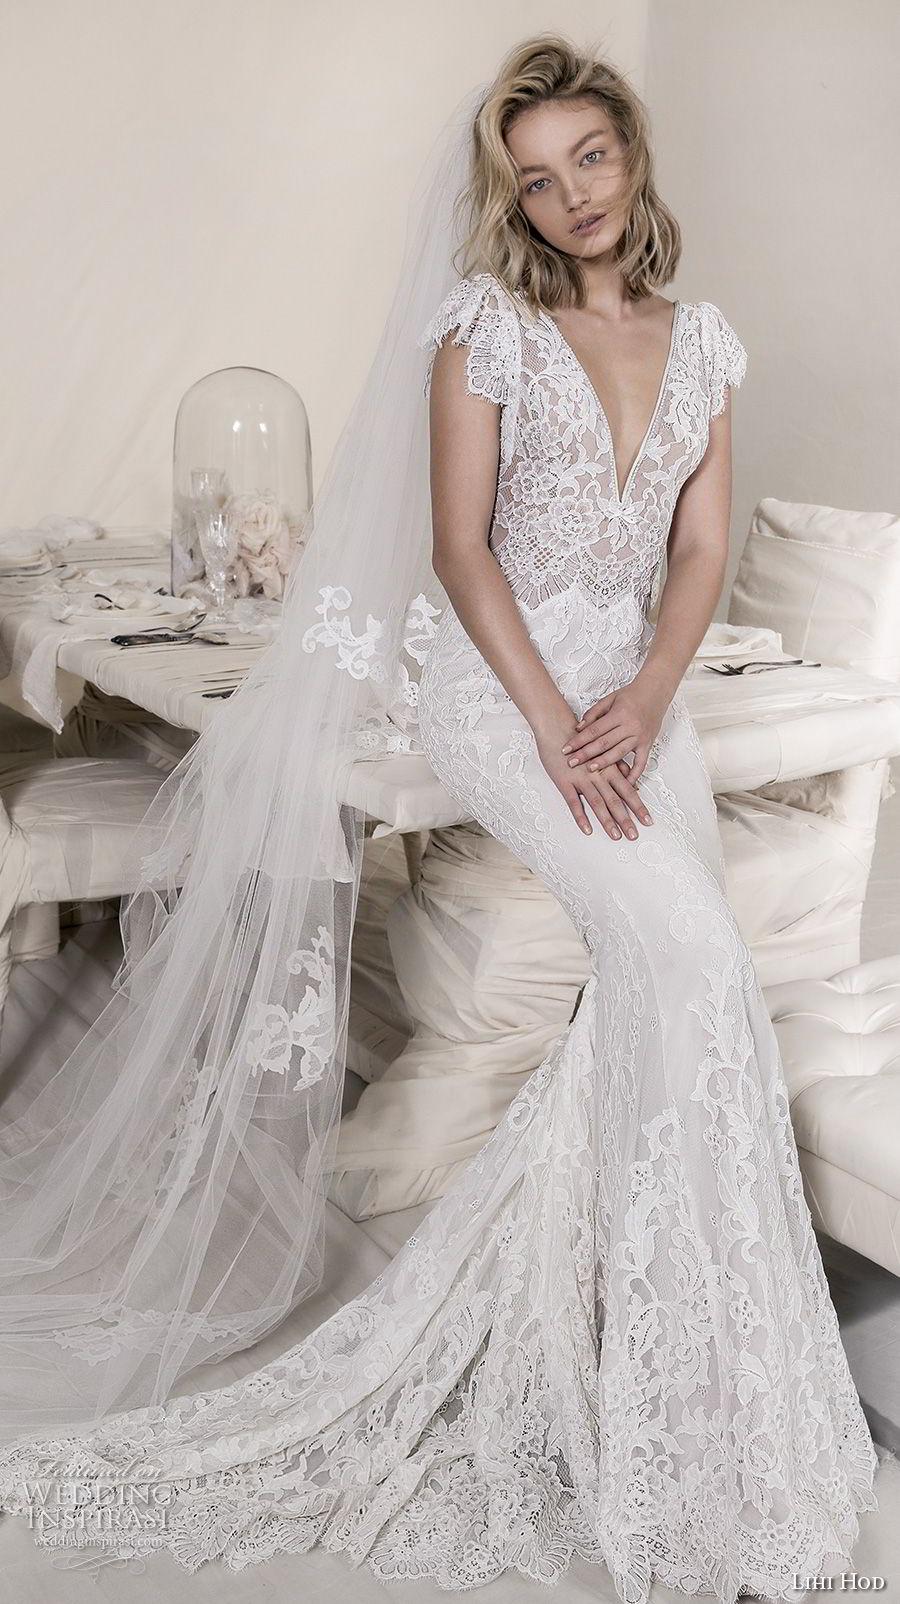 lihi hod 2018 bridal cap sleeves v neck full embellishment elegant romantic fit and flare sheath wedding dress open scoop back sweep train (8) mv